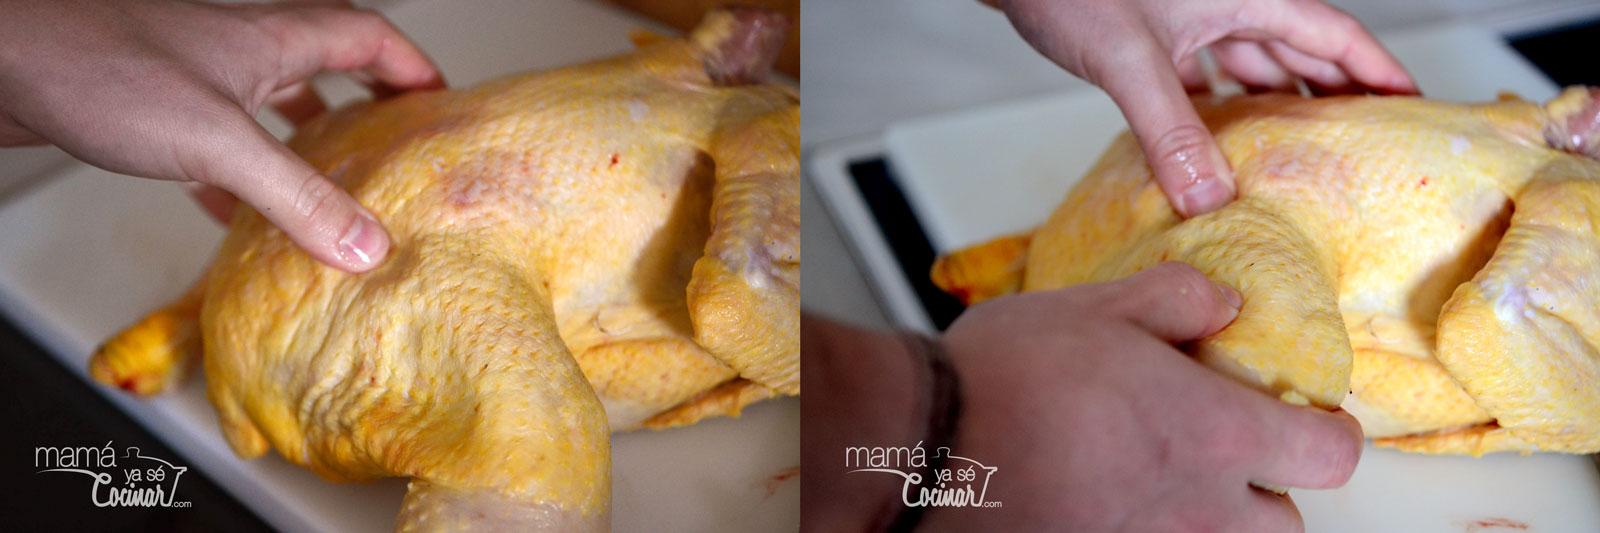 deshuesar-pavo-pollo-gallina2